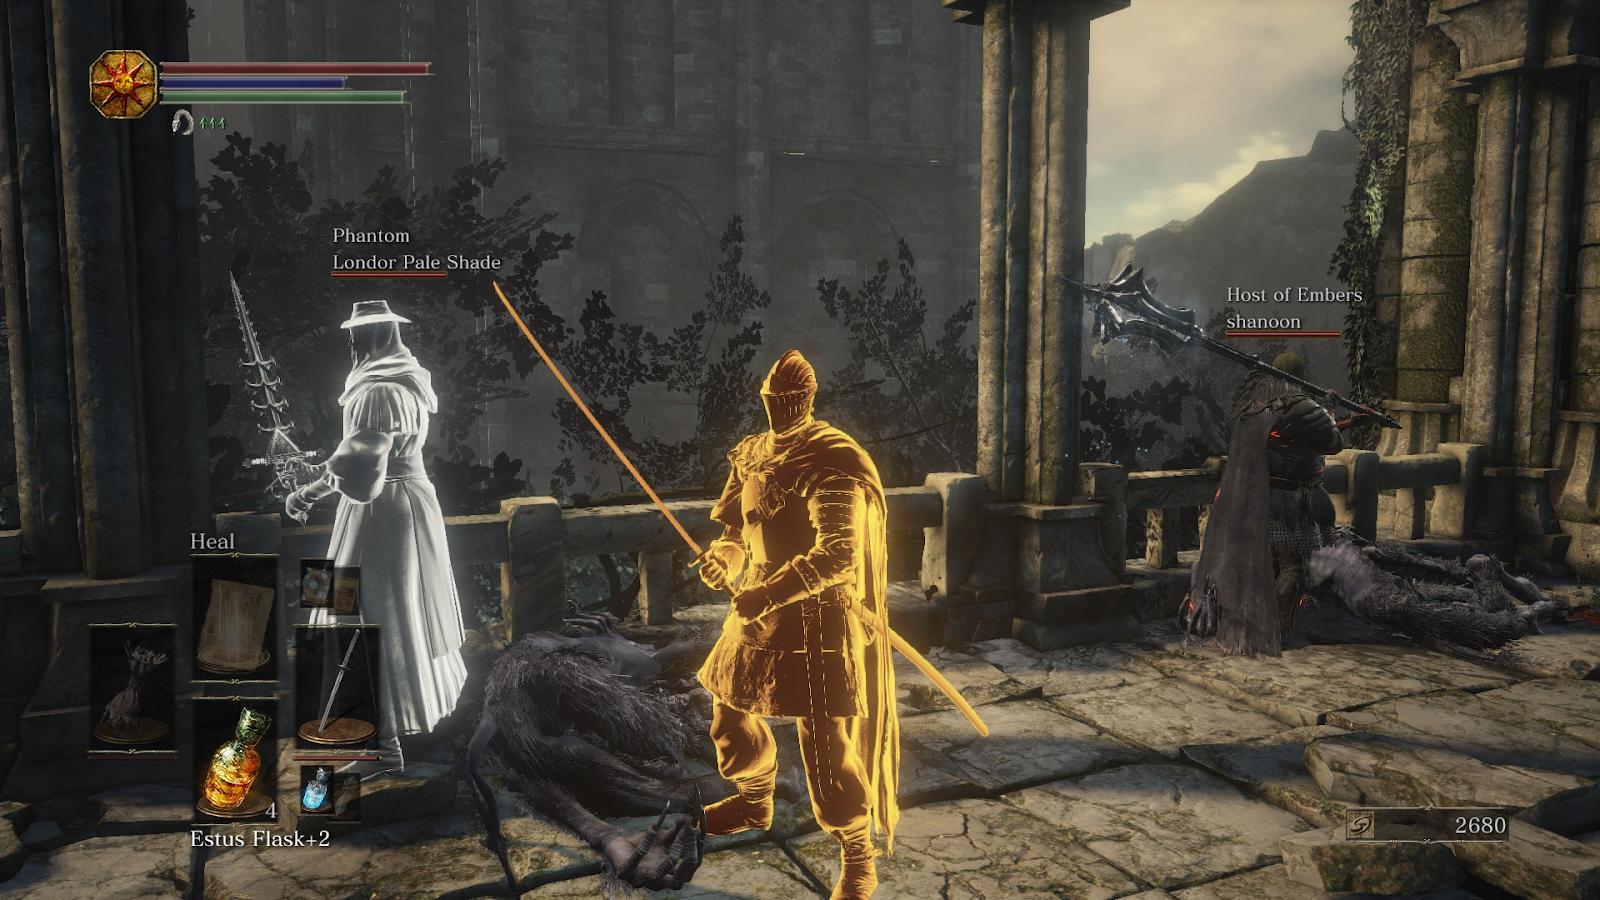 Dark Souls 3: Reading Signs and Summoning Phantoms